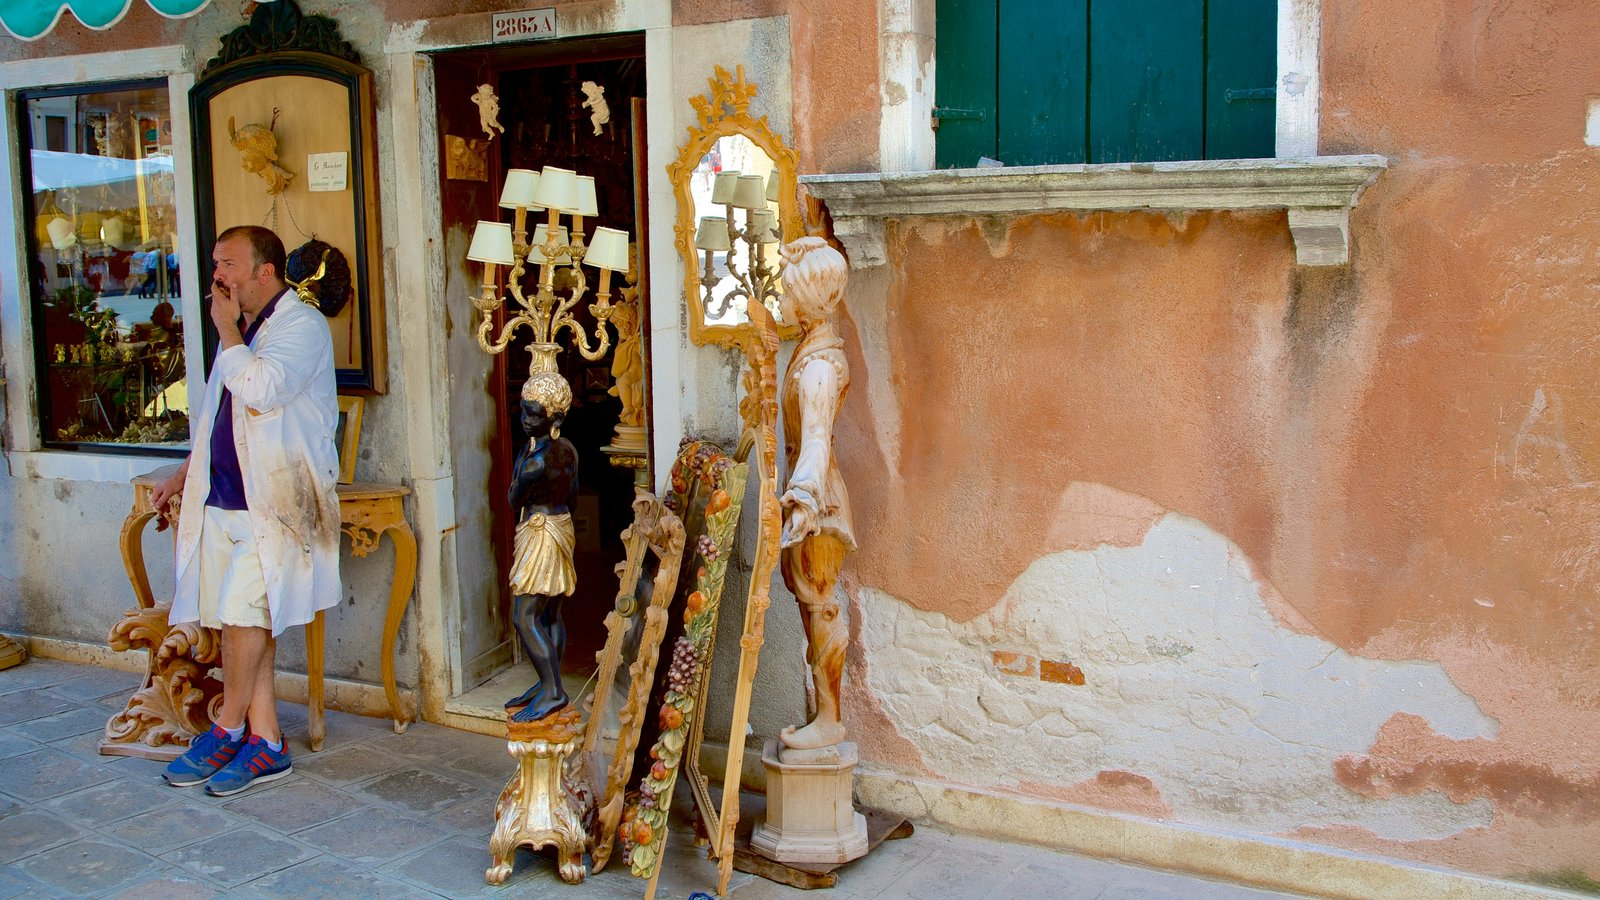 San Marco showing street scenes